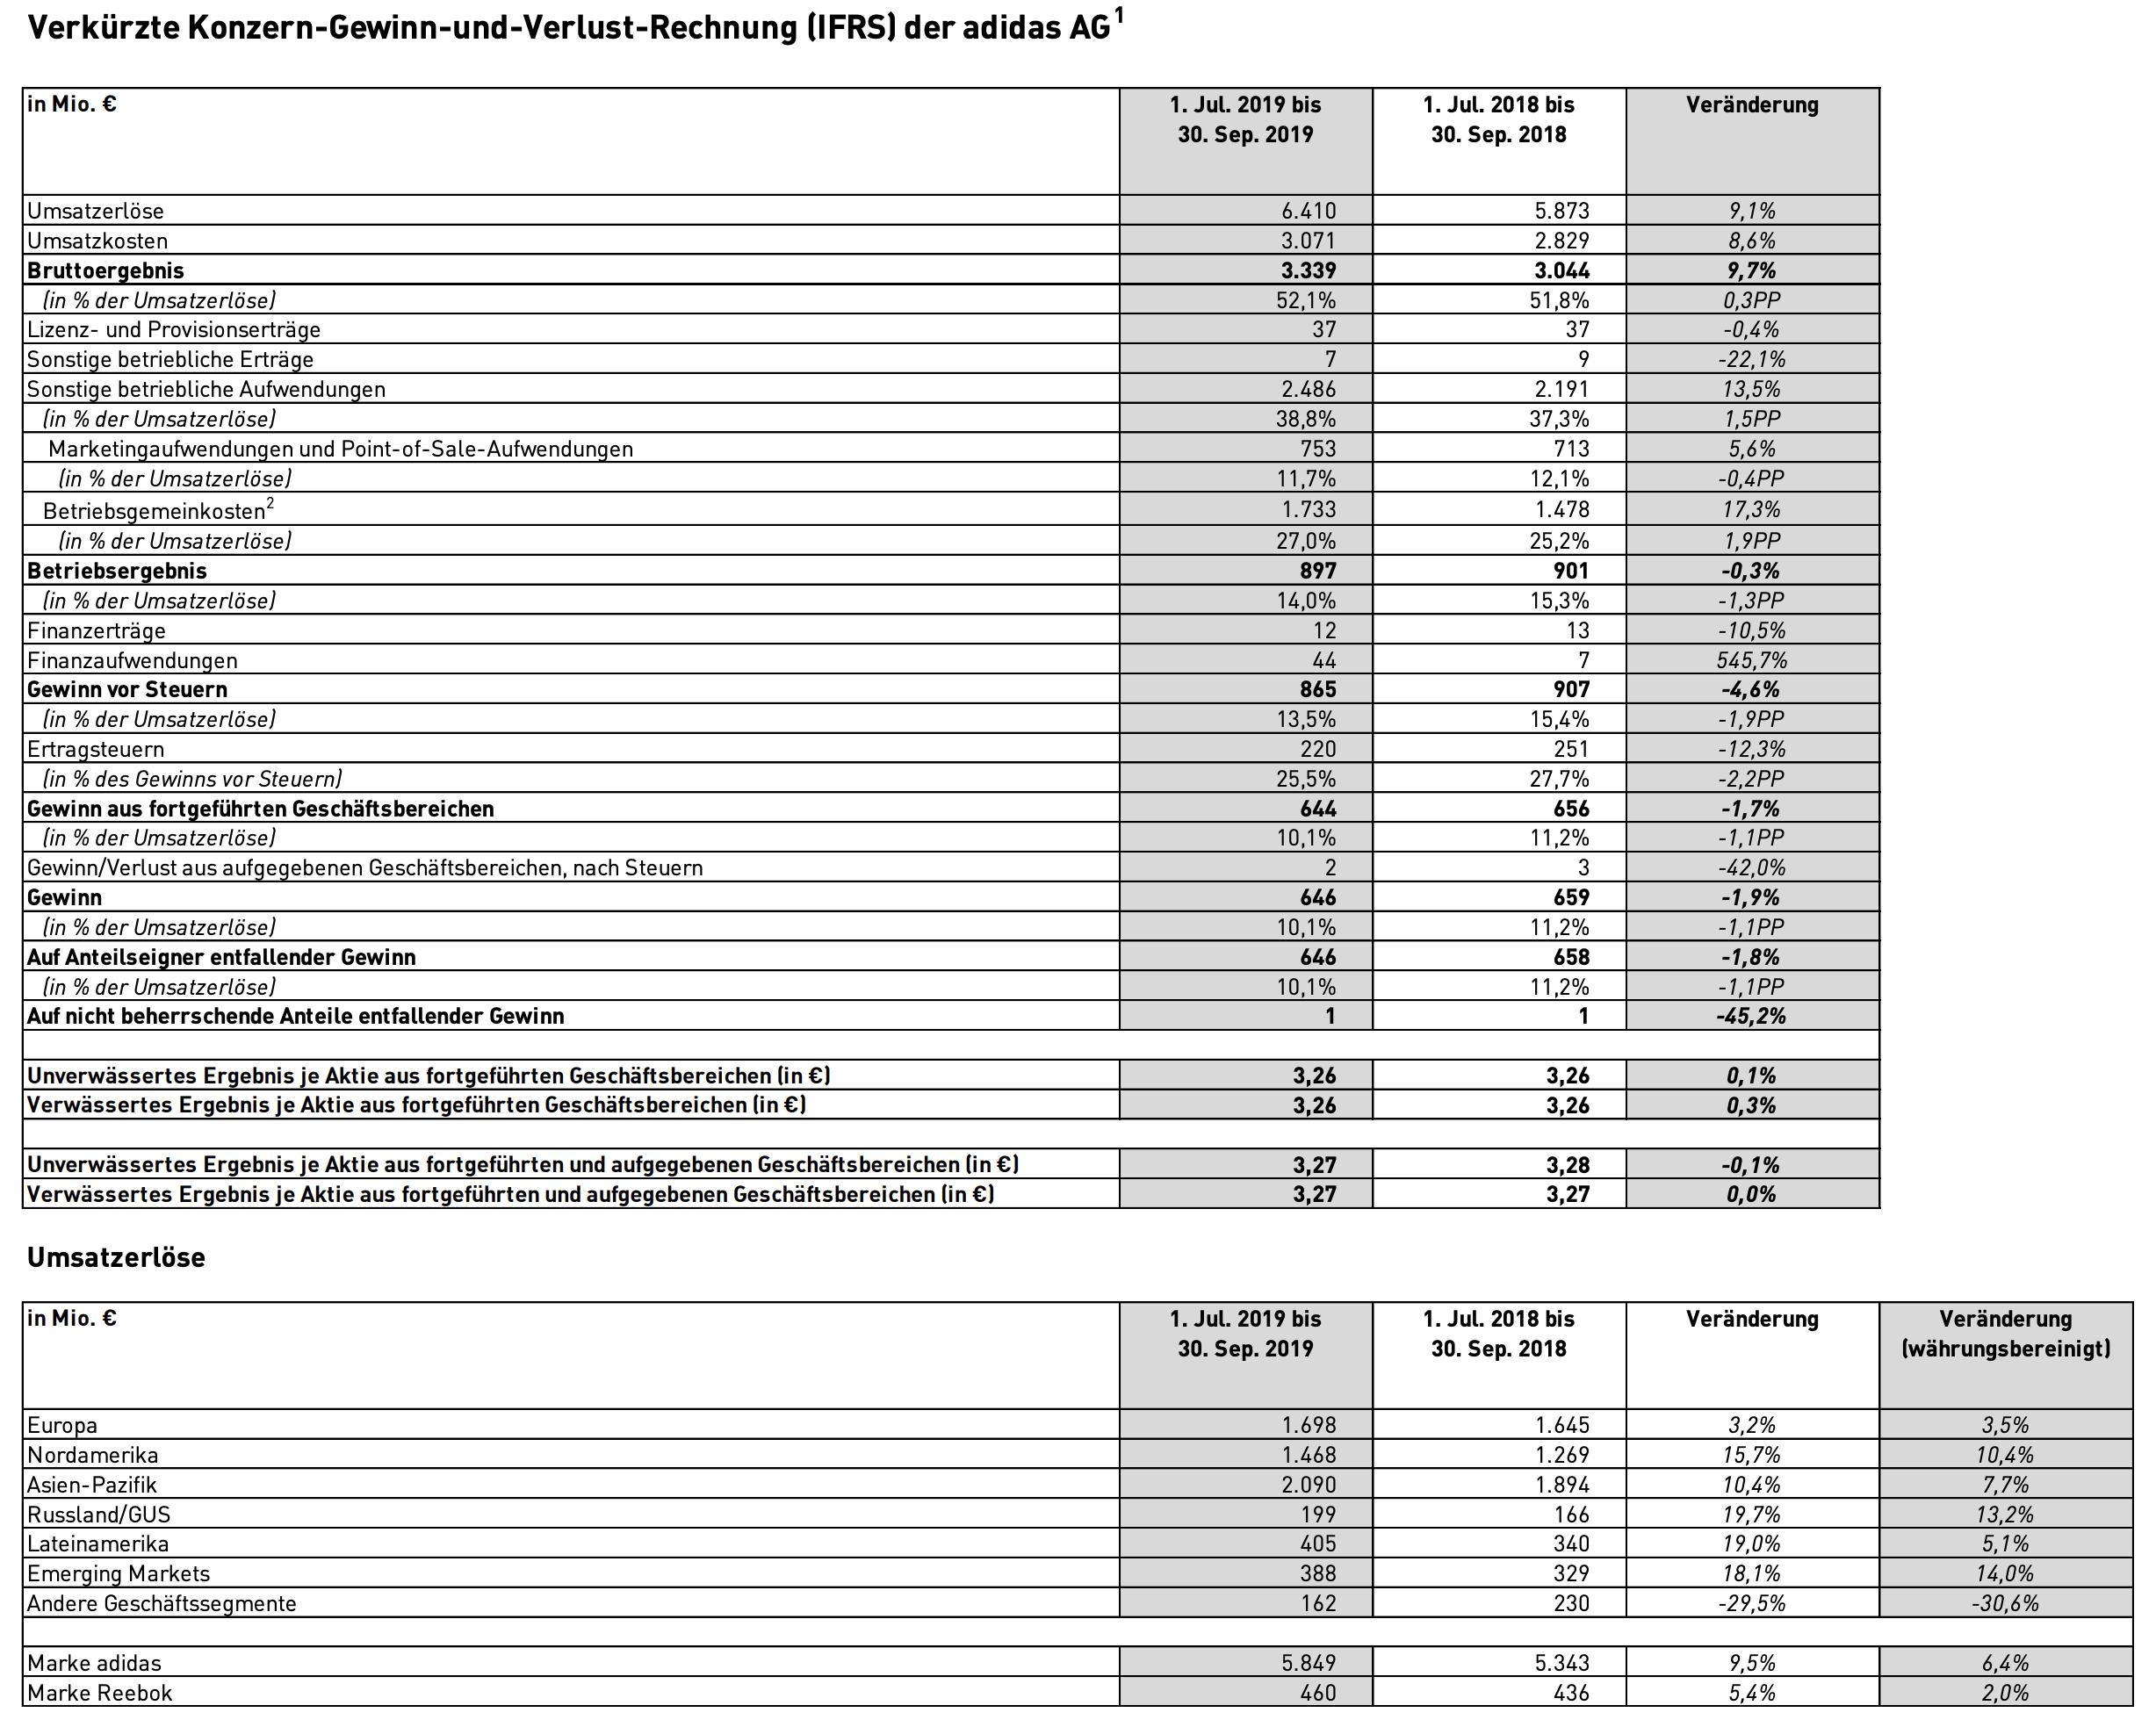 Adidas Quartalszahlen